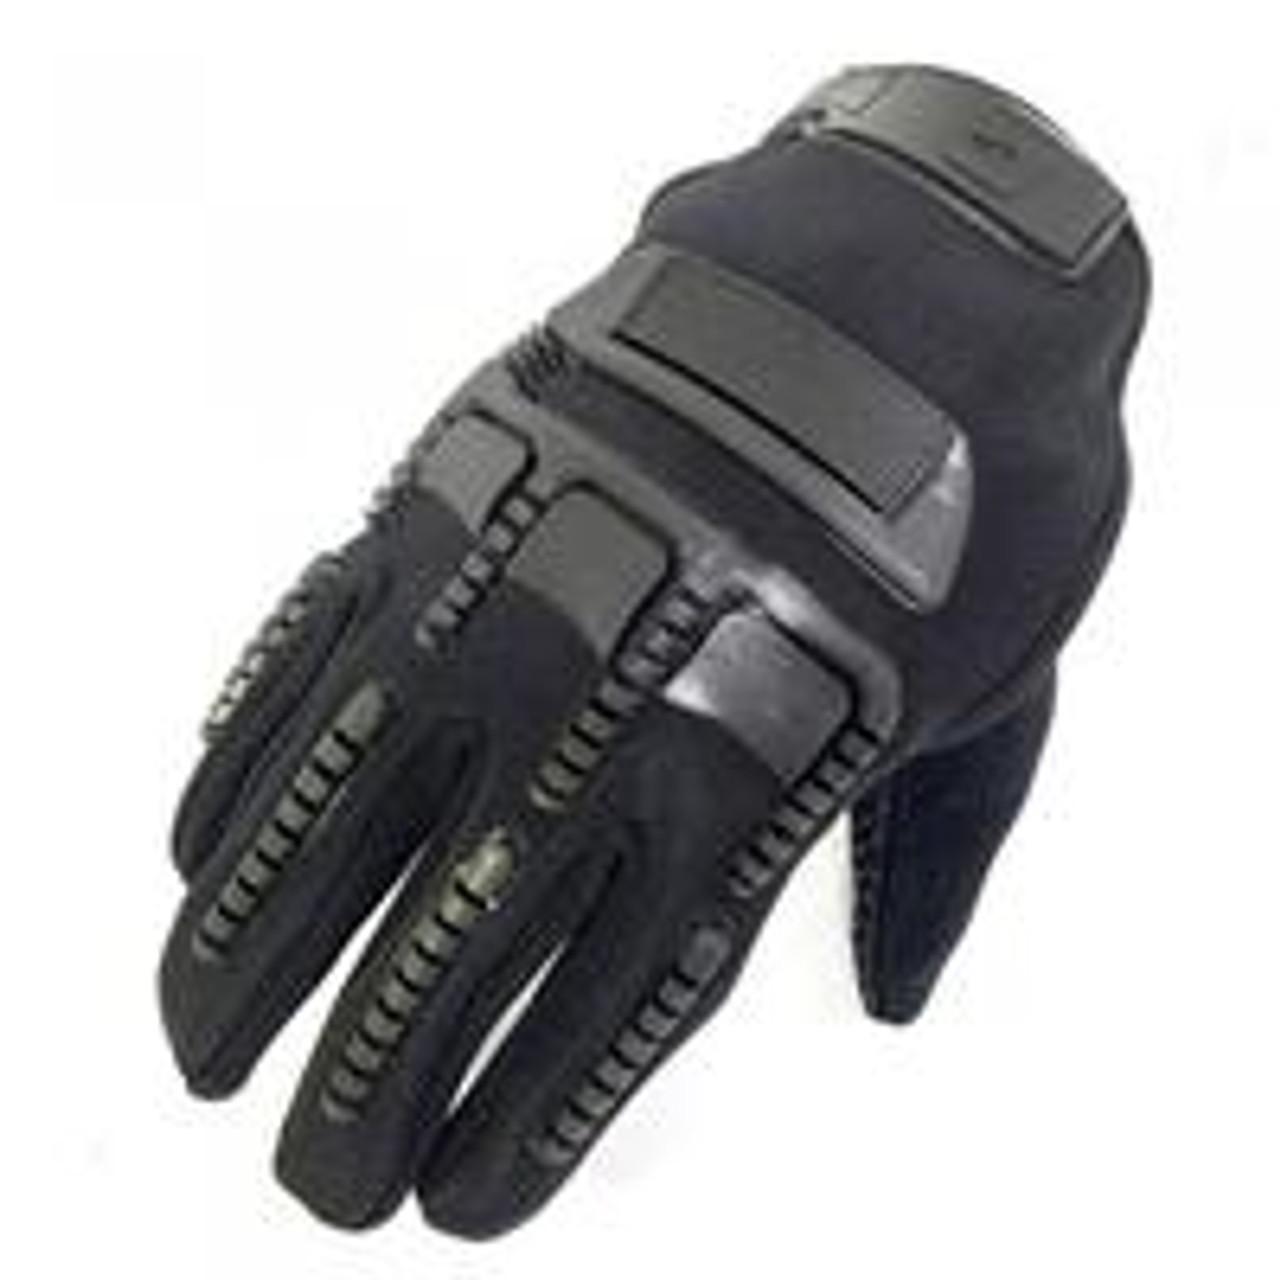 PMC Skirmish Gloves C - Black